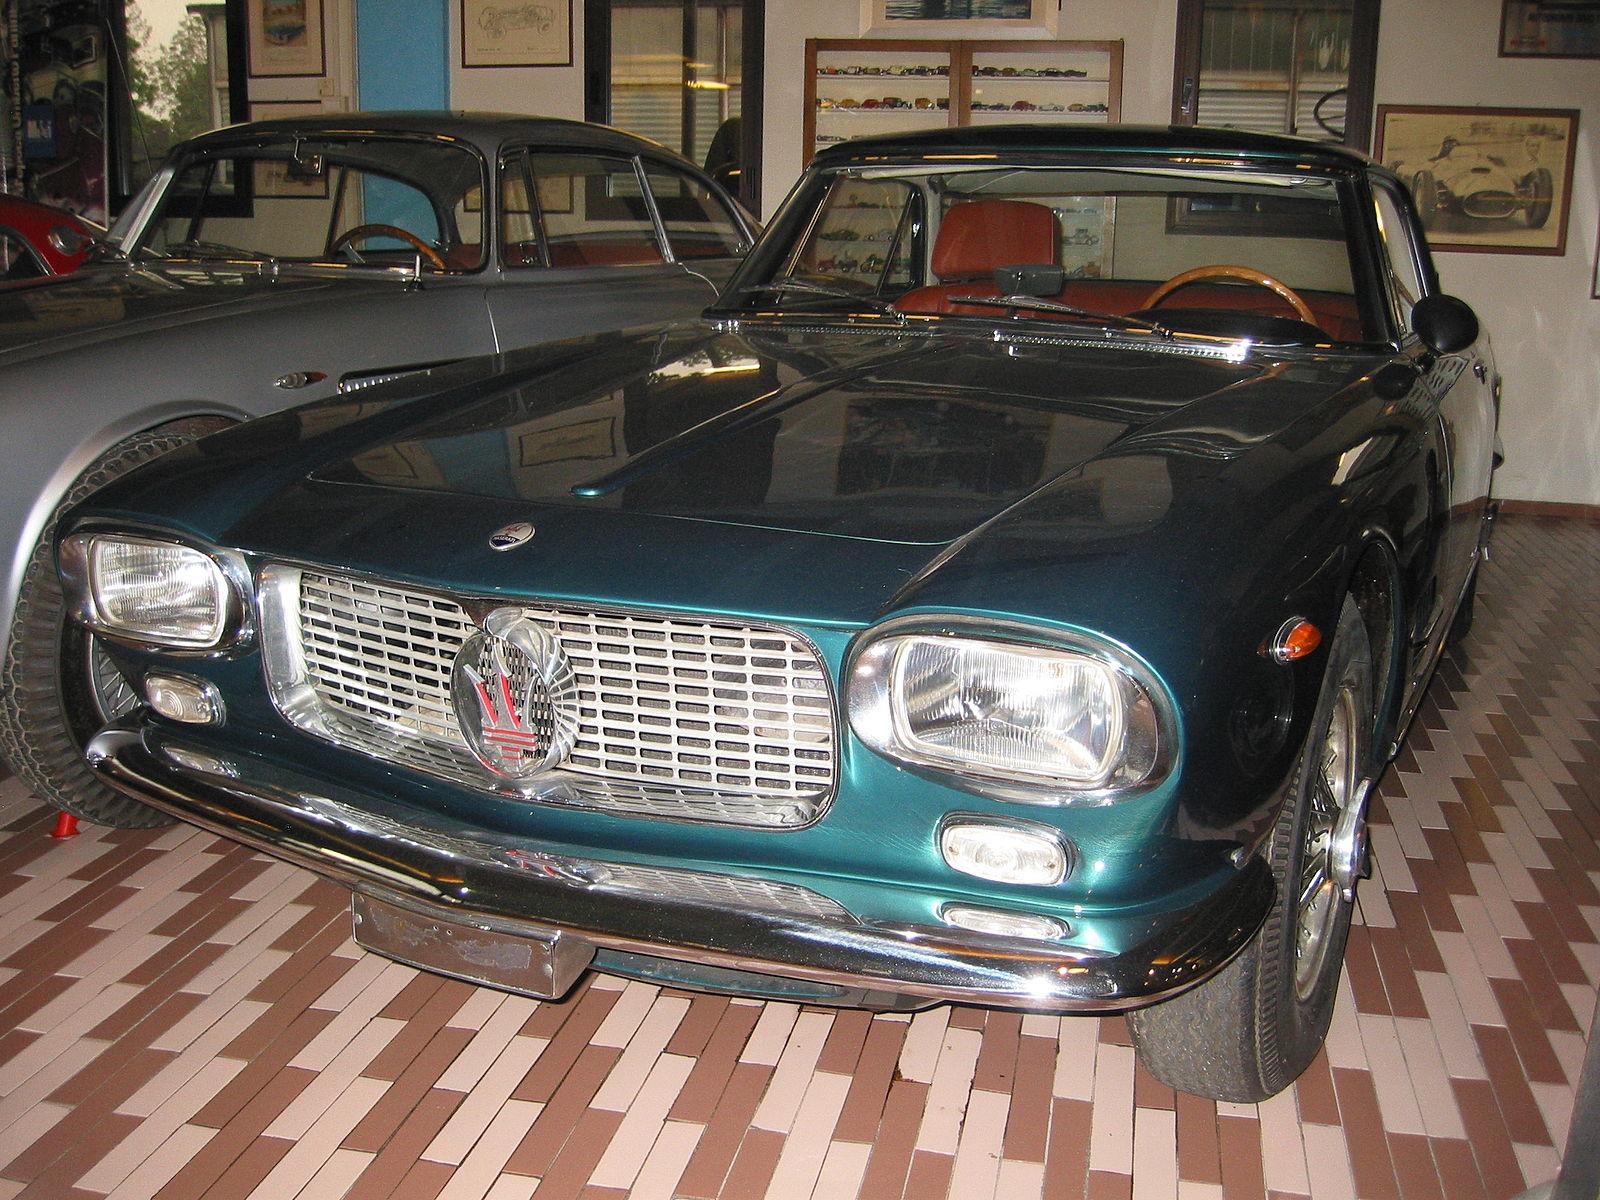 Datei:Maserati 5000 GT Allemano 1964 vr.JPG - Wikipedia